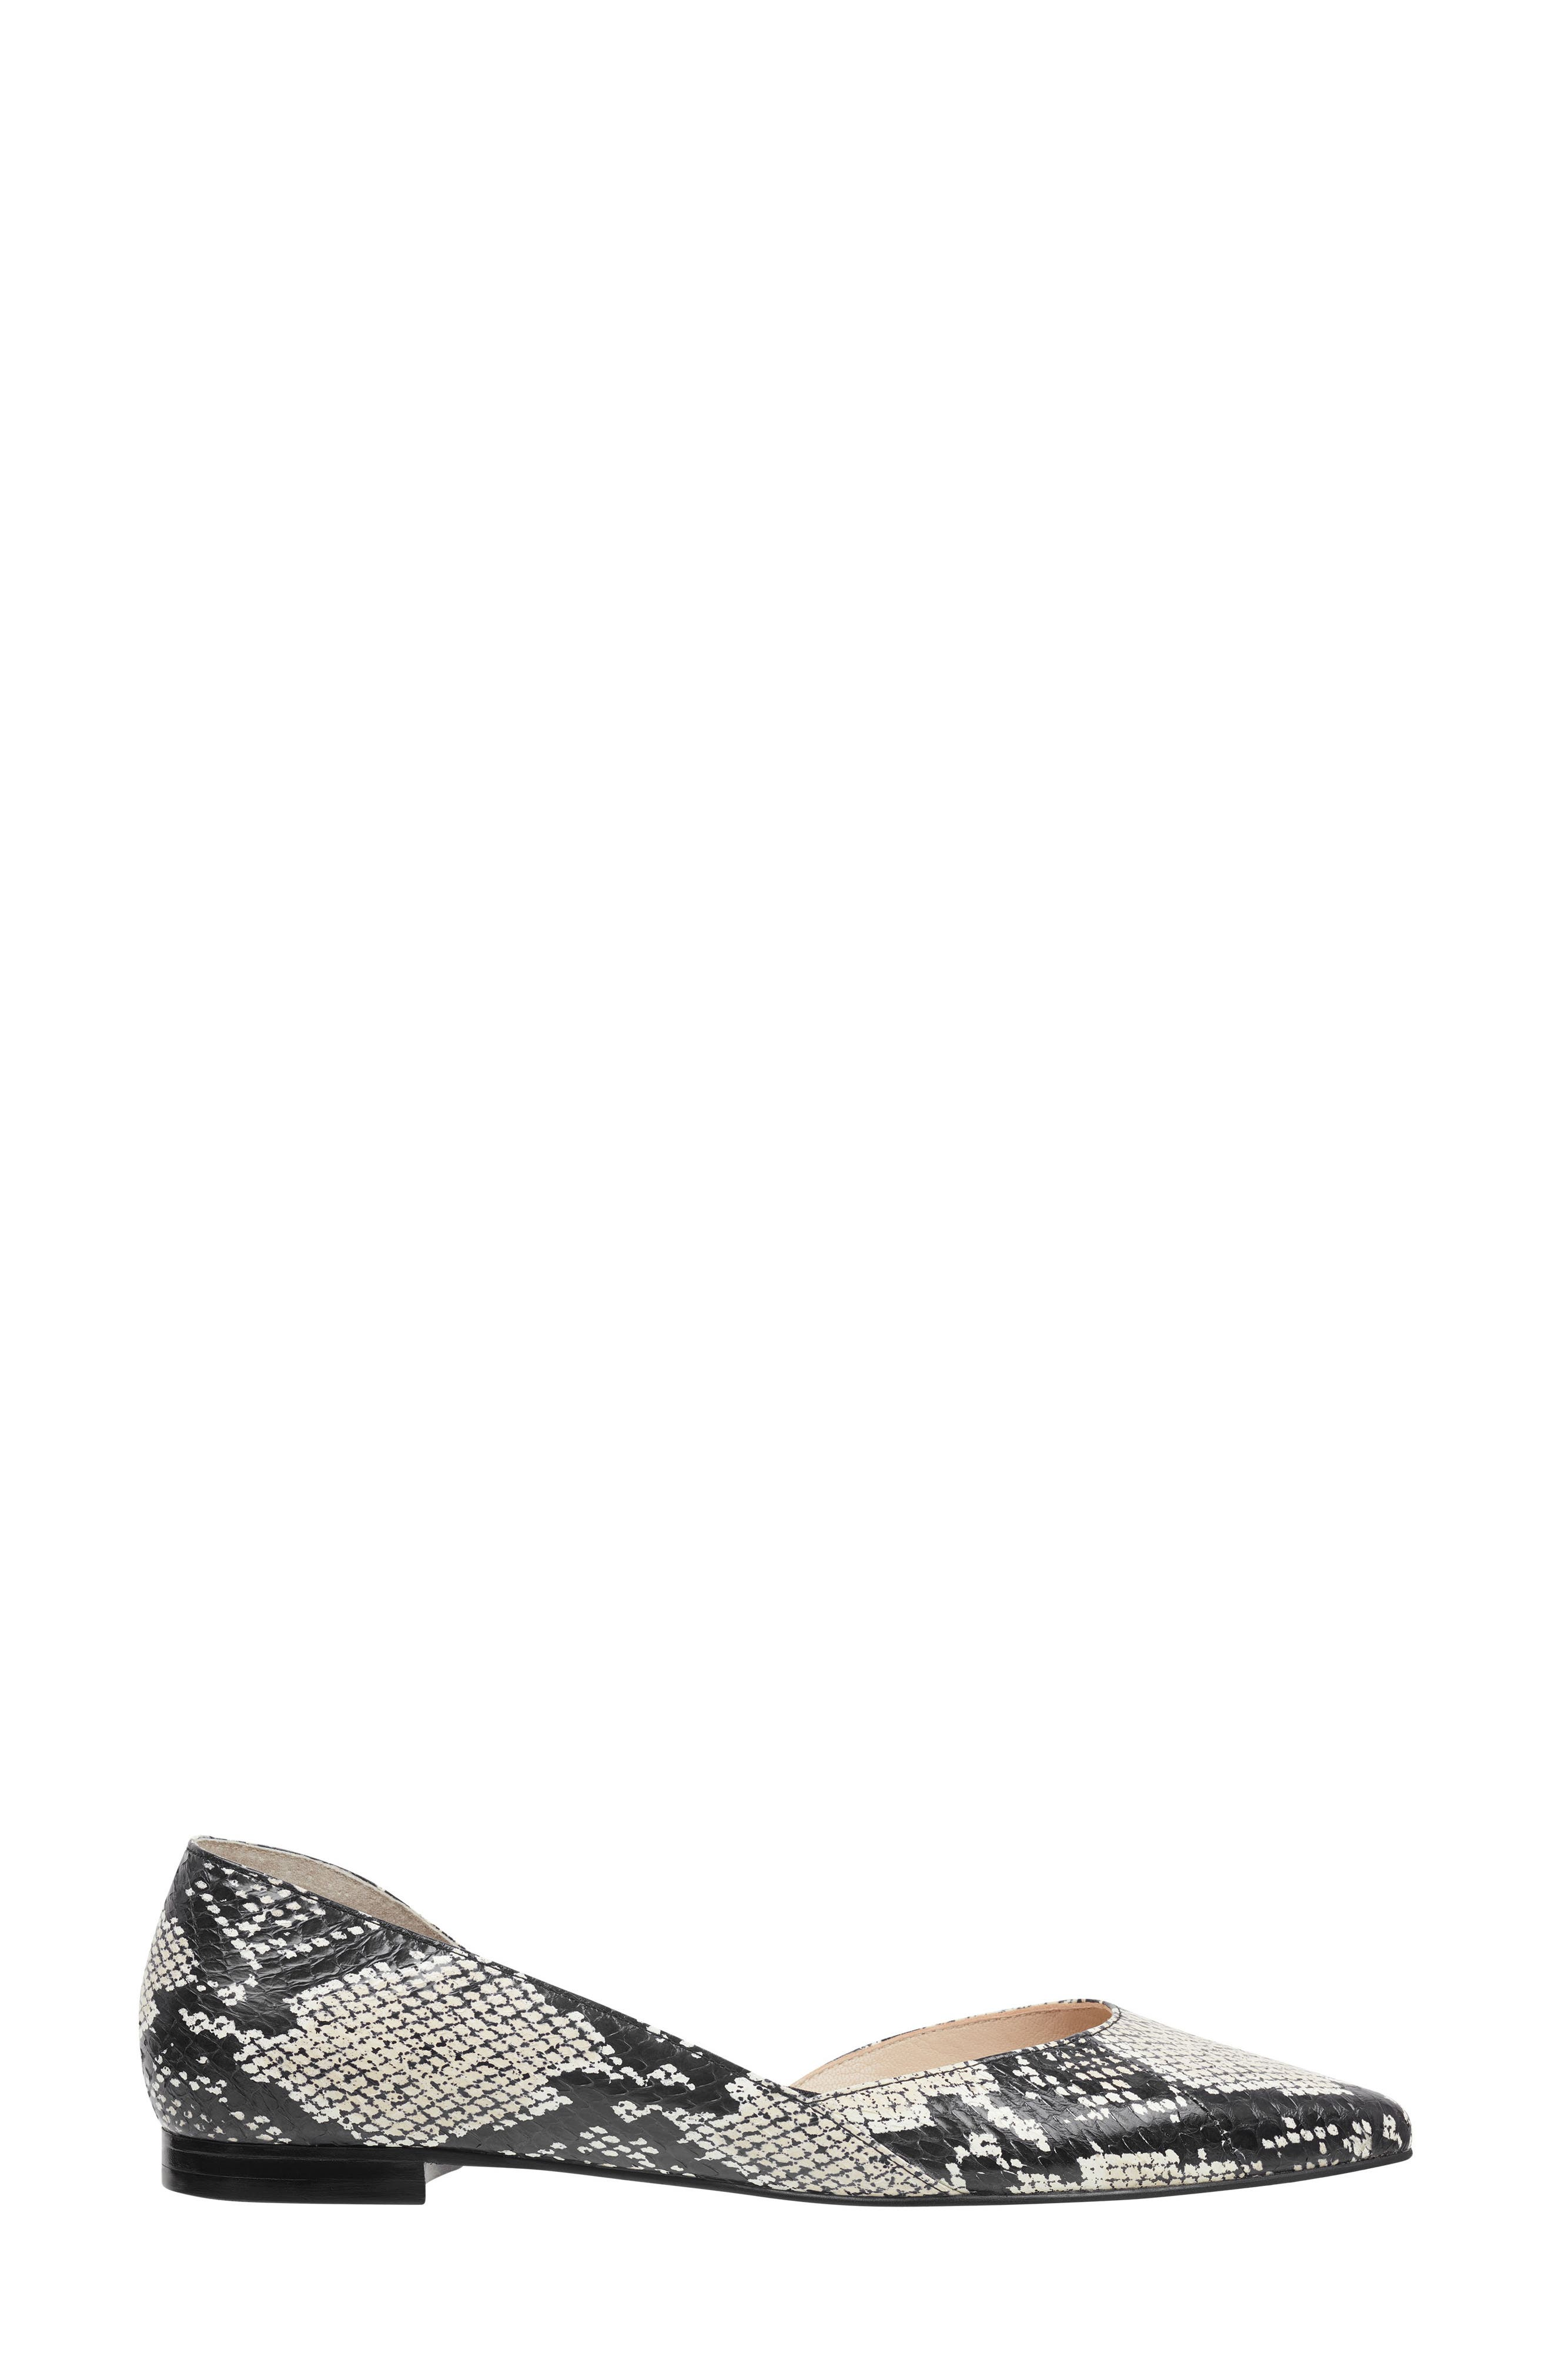 MARC FISHER LTD, 'Sunny' Half d'Orsay Flat, Alternate thumbnail 3, color, BEIGE/ BLACK SNAKE